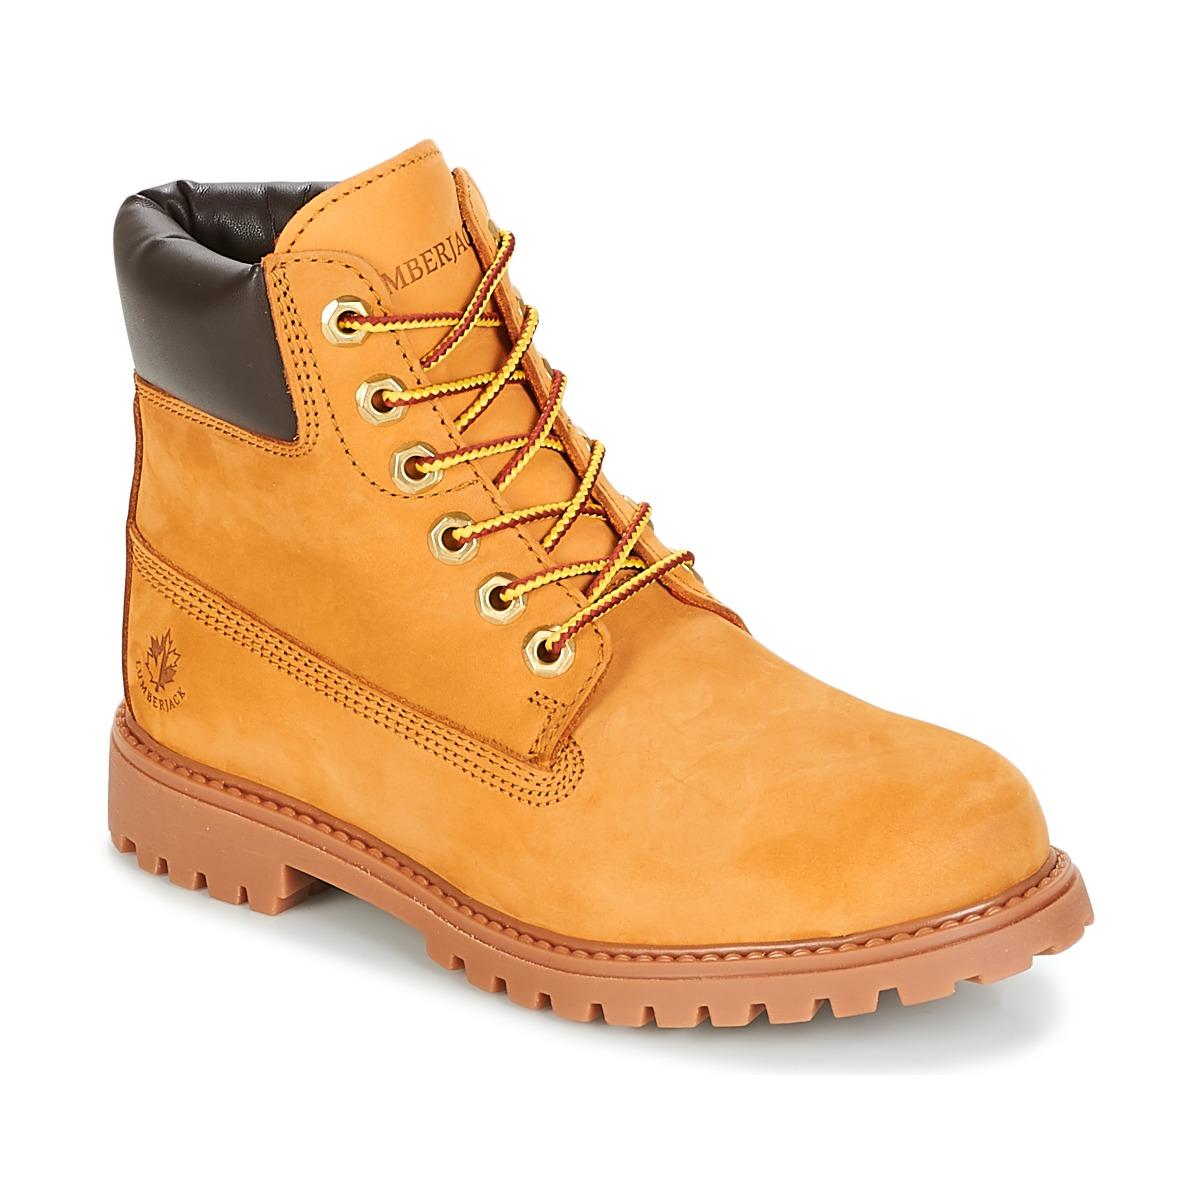 Lumberjack RIVER Honig - Kostenloser Versand bei Spartoode ! - Schuhe Boots Damen 87,90 €